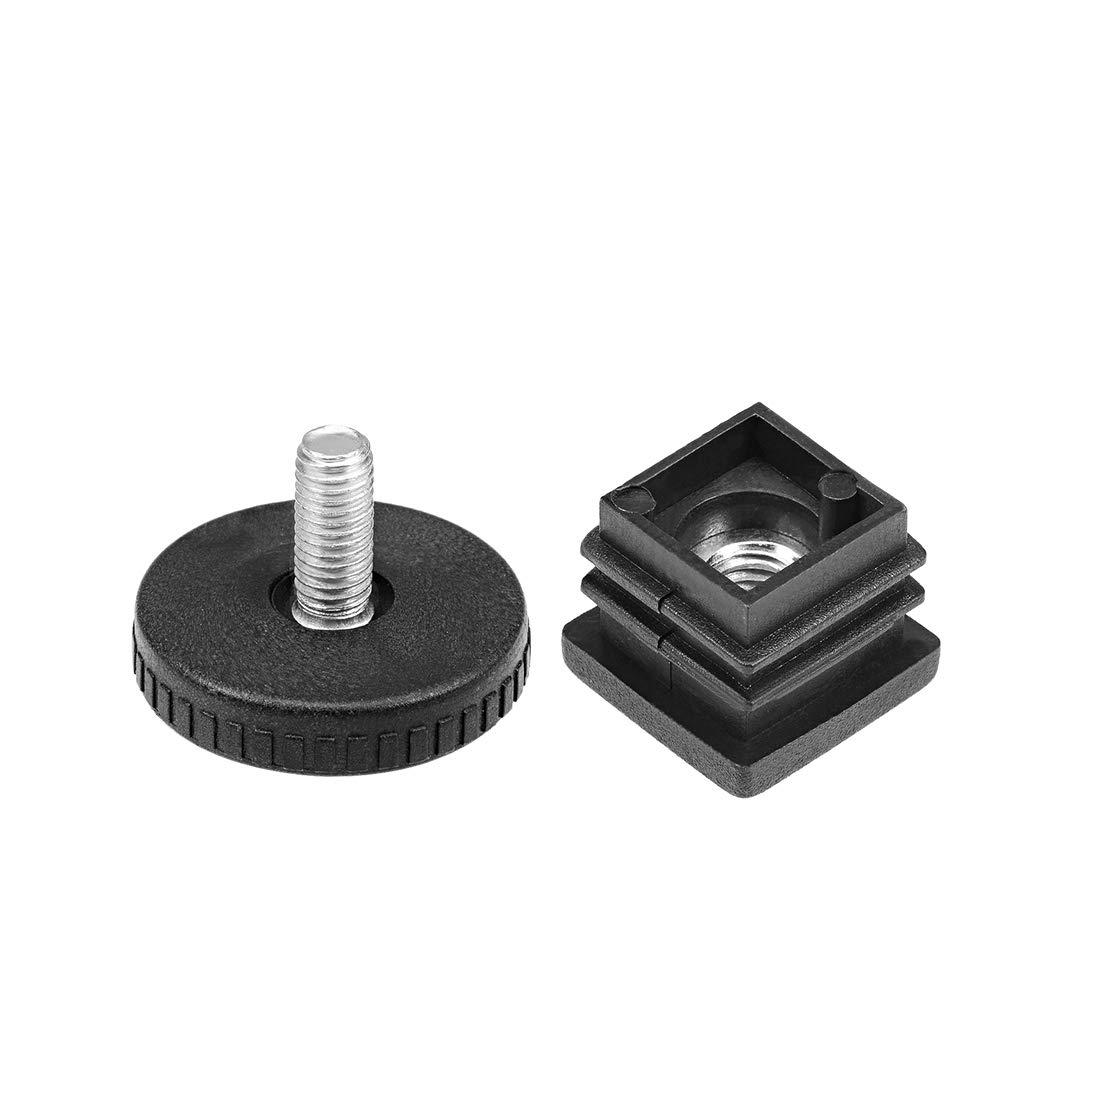 uxcell Furniture Levelers Adjustable Leveling Glides 40mm Base Dia M8 Thread 8pcs